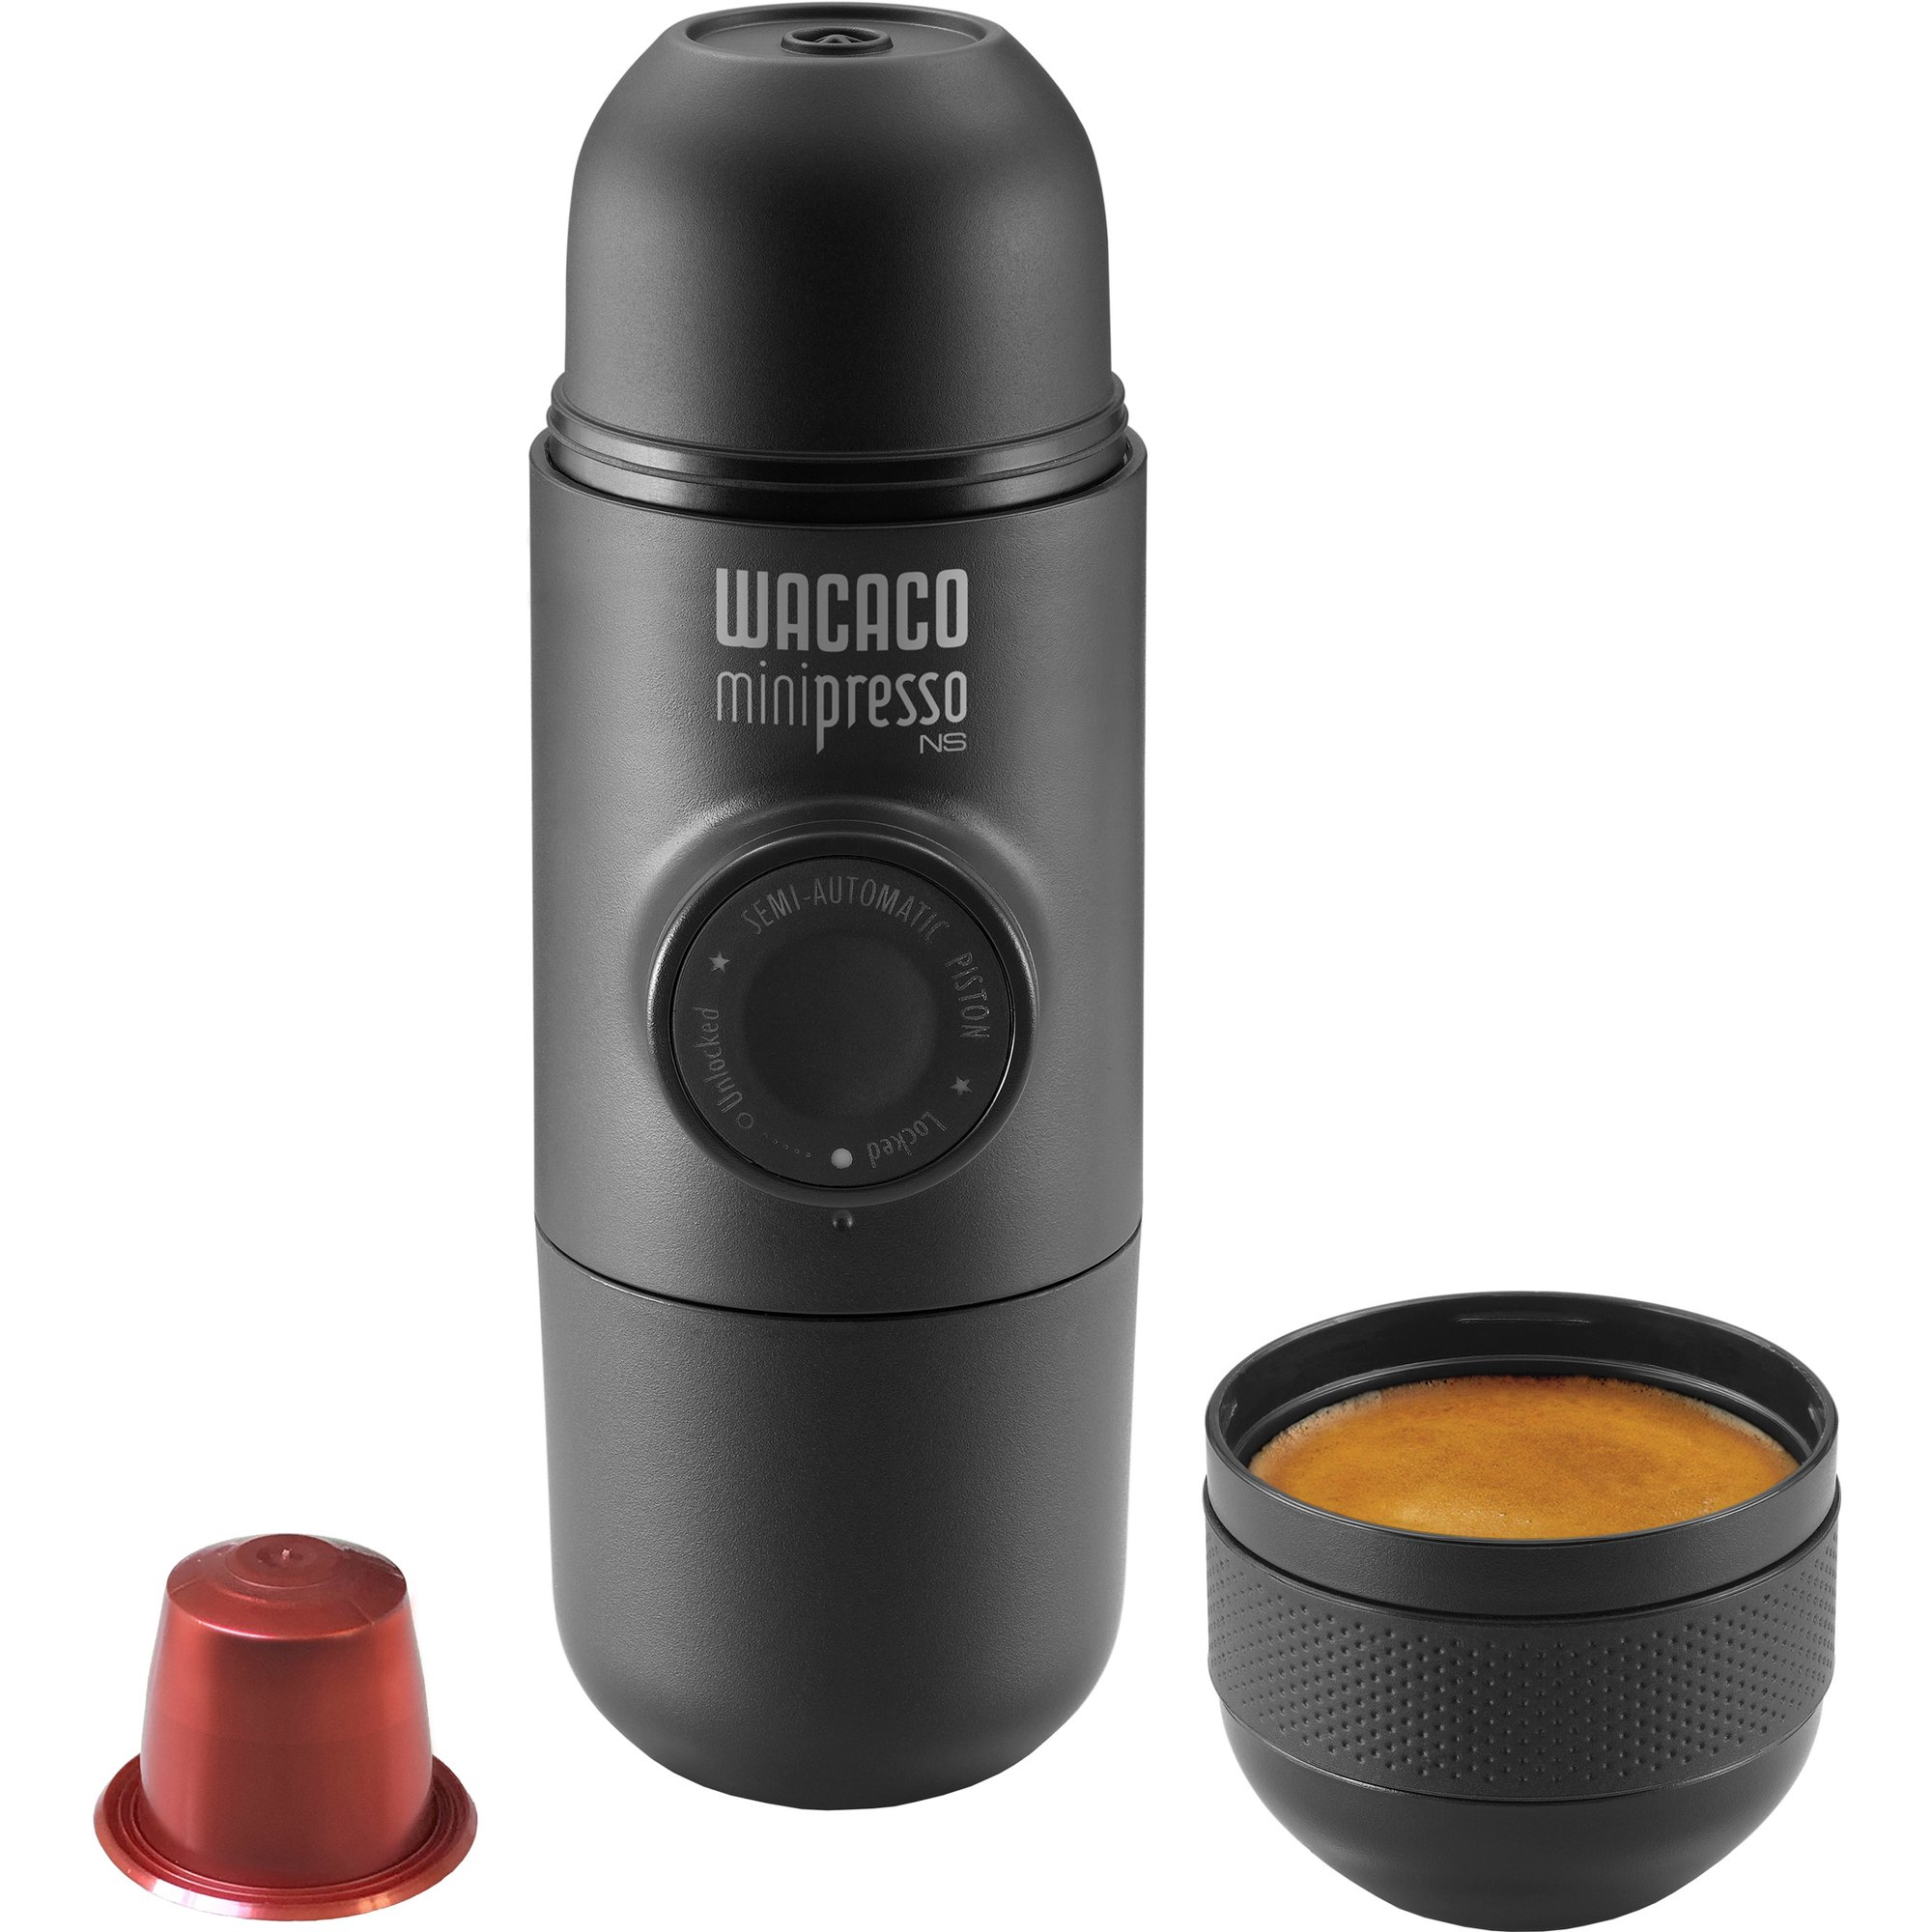 Wacaco Minipresso NS espressobryggare grå